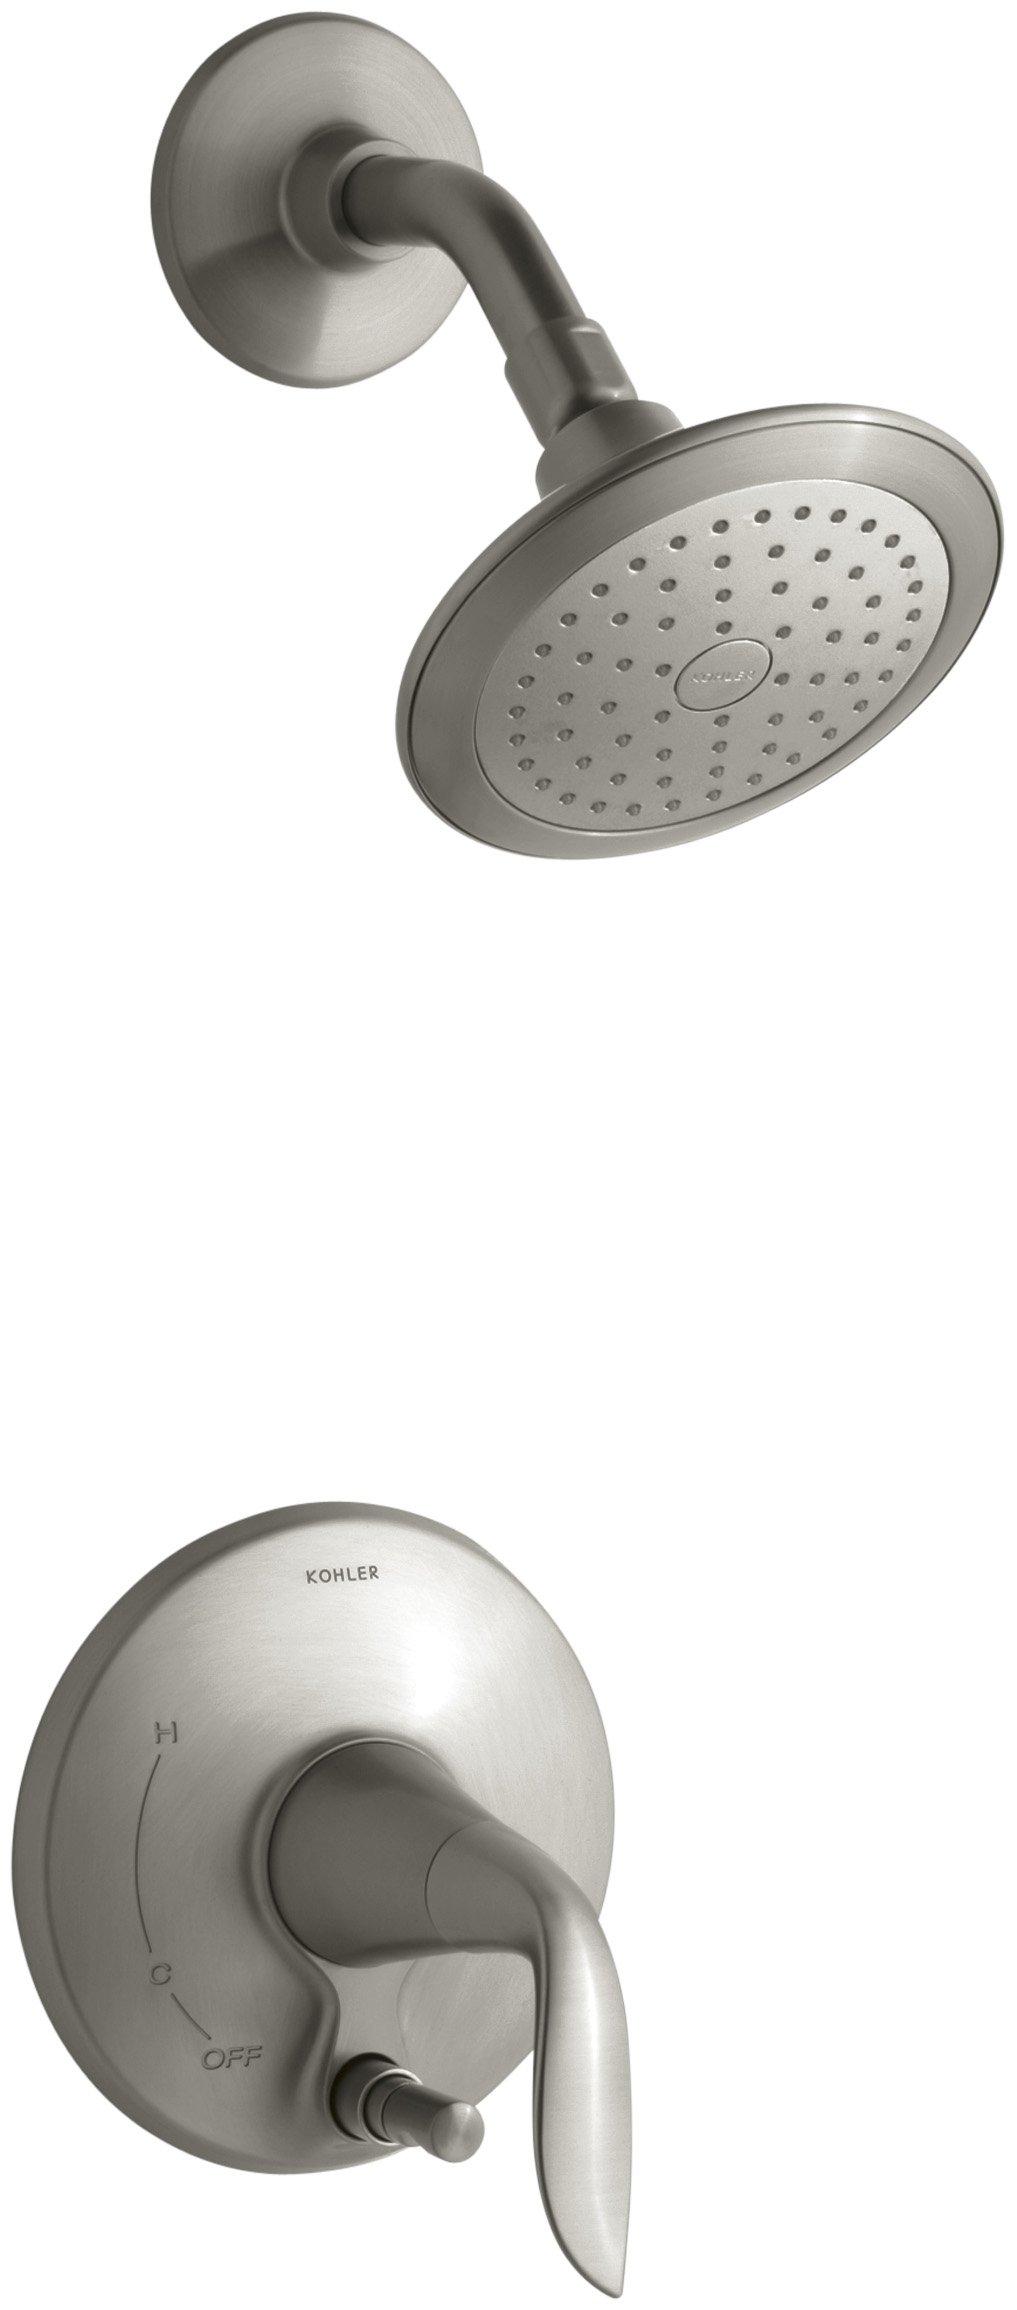 Cheap Push Button Shower Diverter Find Push Button Shower